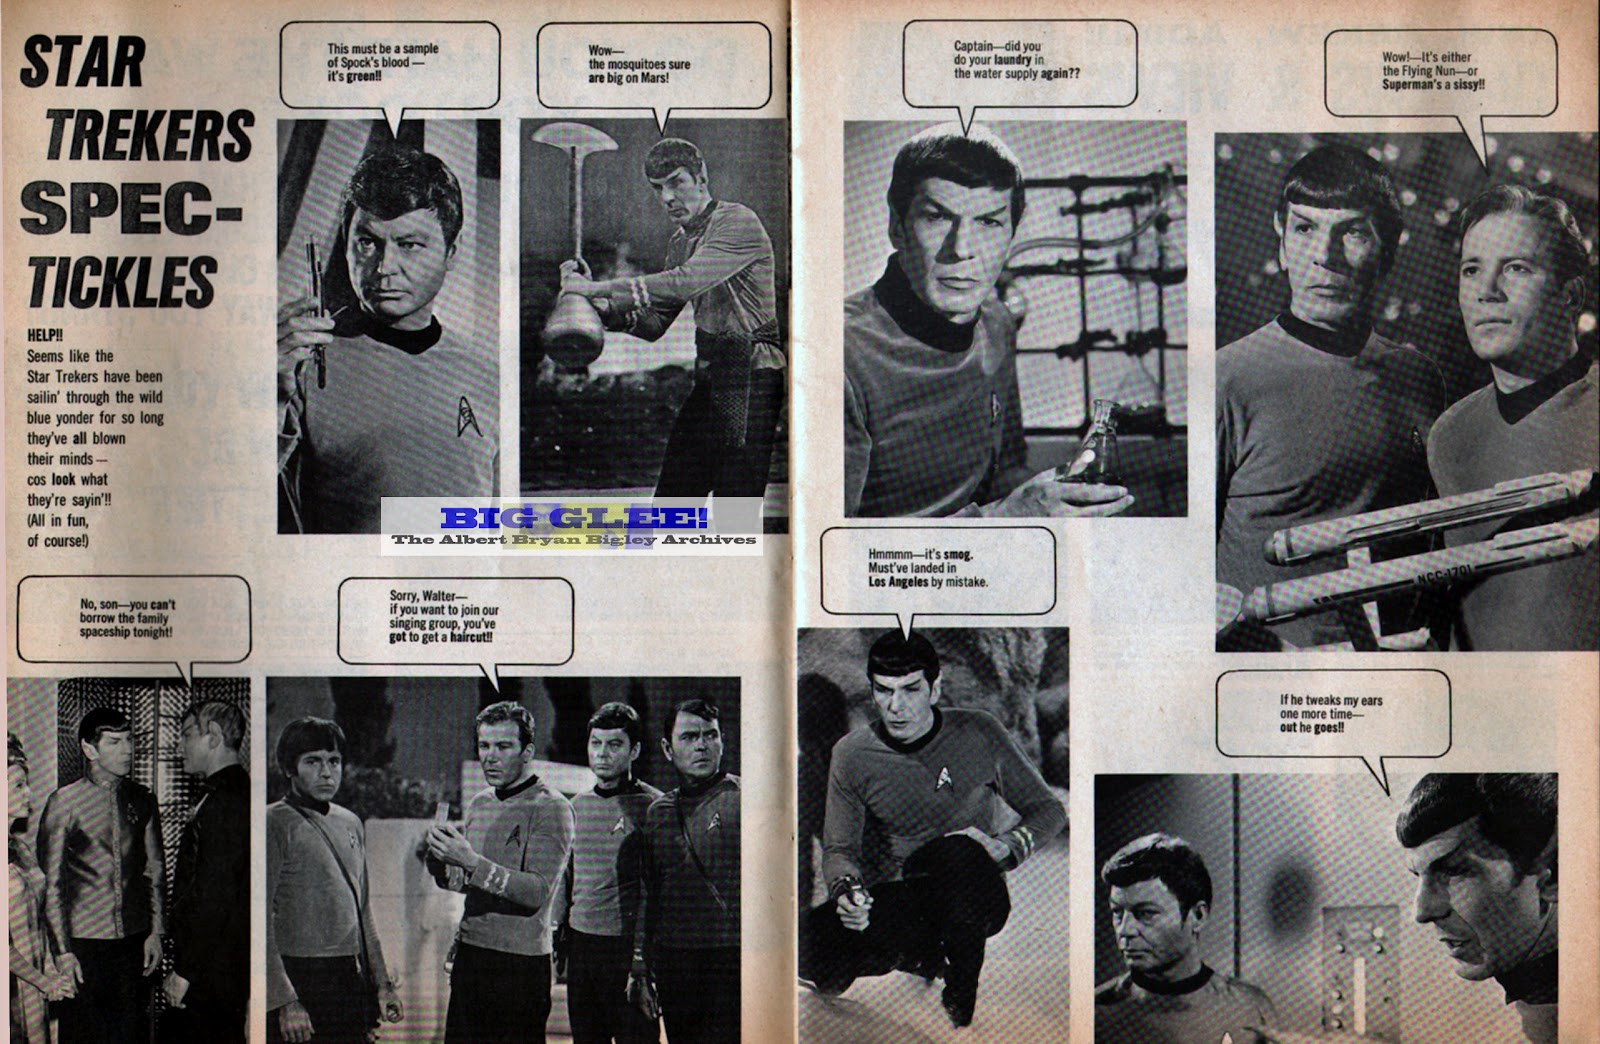 http://1.bp.blogspot.com/-JbMegH9r3hs/T3HAqb-soRI/AAAAAAAAGS4/8v5dKyxZfdk/s1600/star+trek+teen+magazine+shatner+nimoy+spock+kirk+nbc+chekov+1966+3.jpg